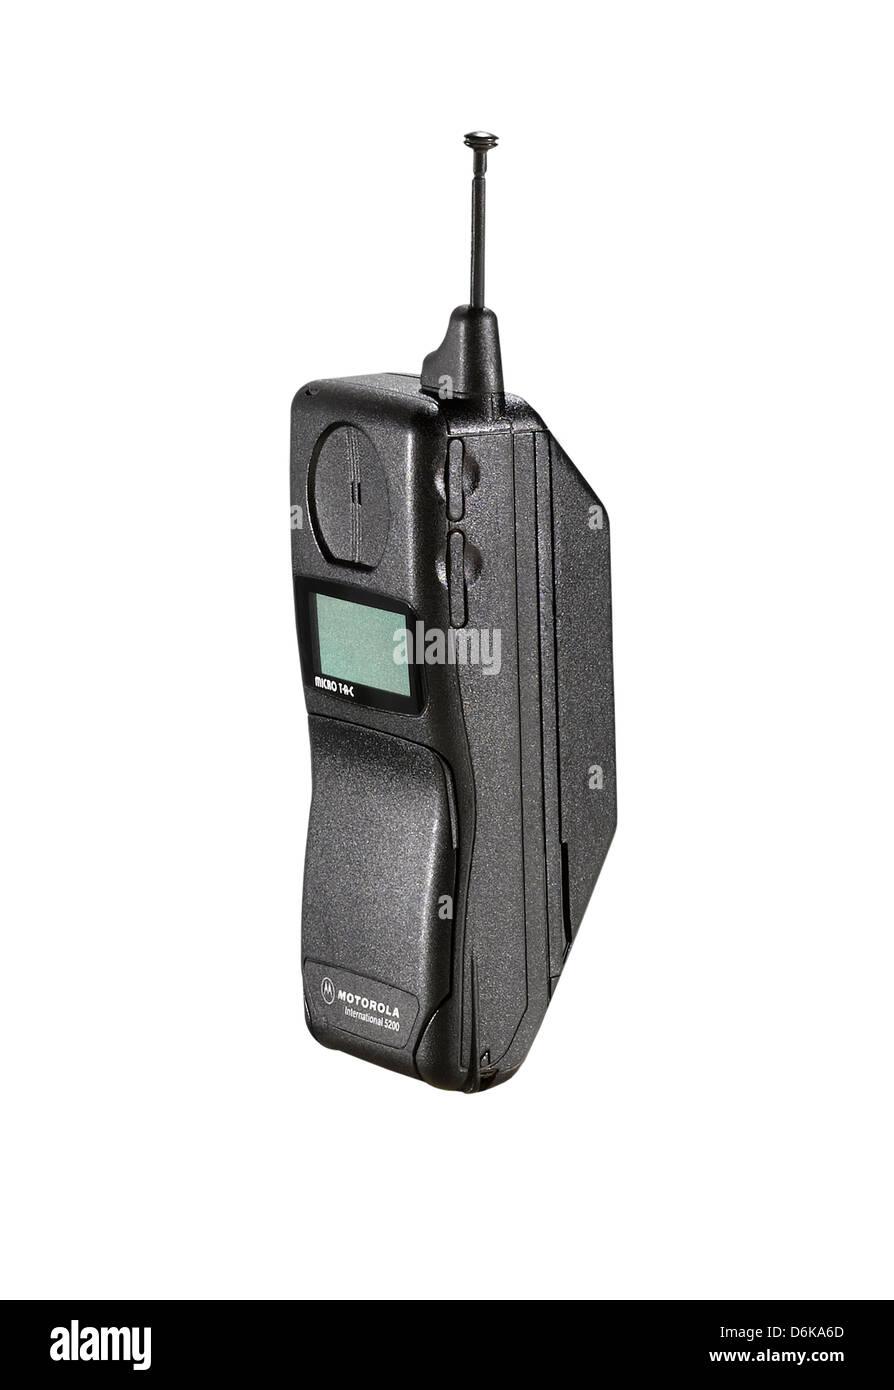 Un ancien style flip Motorola mobile phone Photo Stock